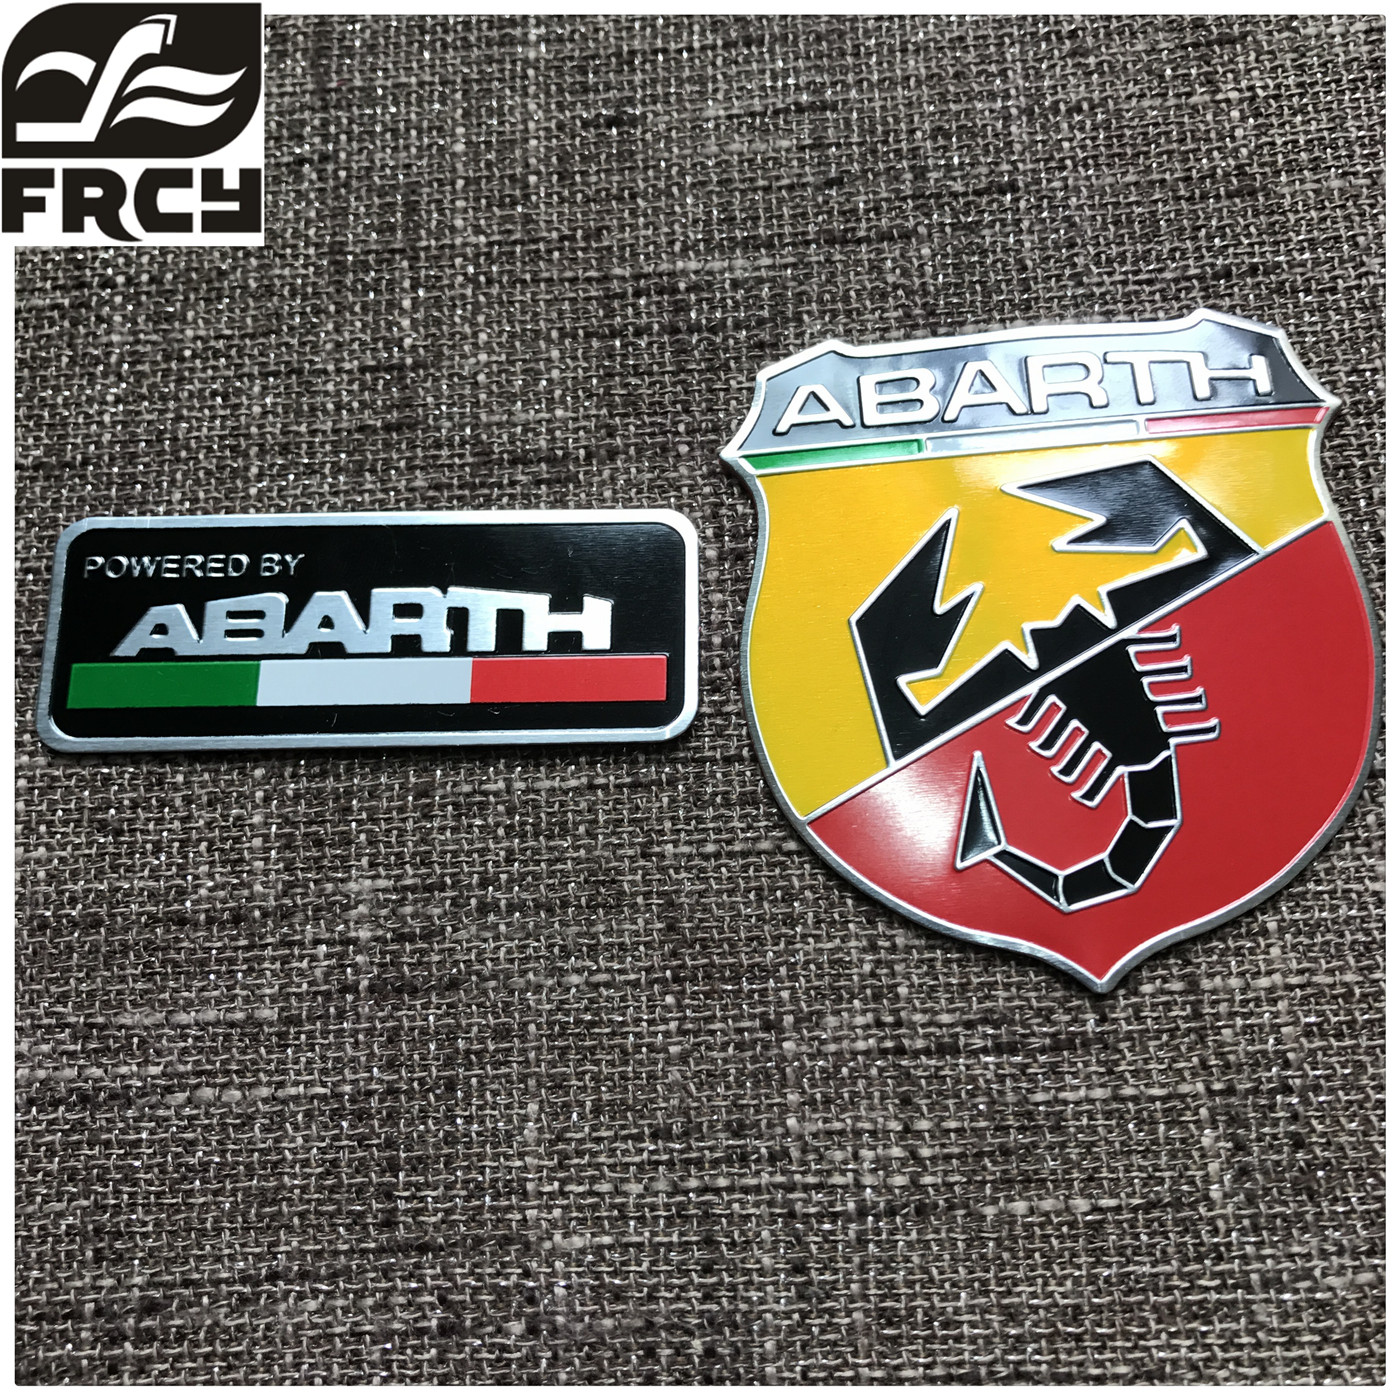 2017 3d Car Abarth Metal Adhesive Badge Emblem Logo Decal Sticker Scorpion For All Fiat Punto 124/125/125/500 Styling abarth фиат ритмо запчасть